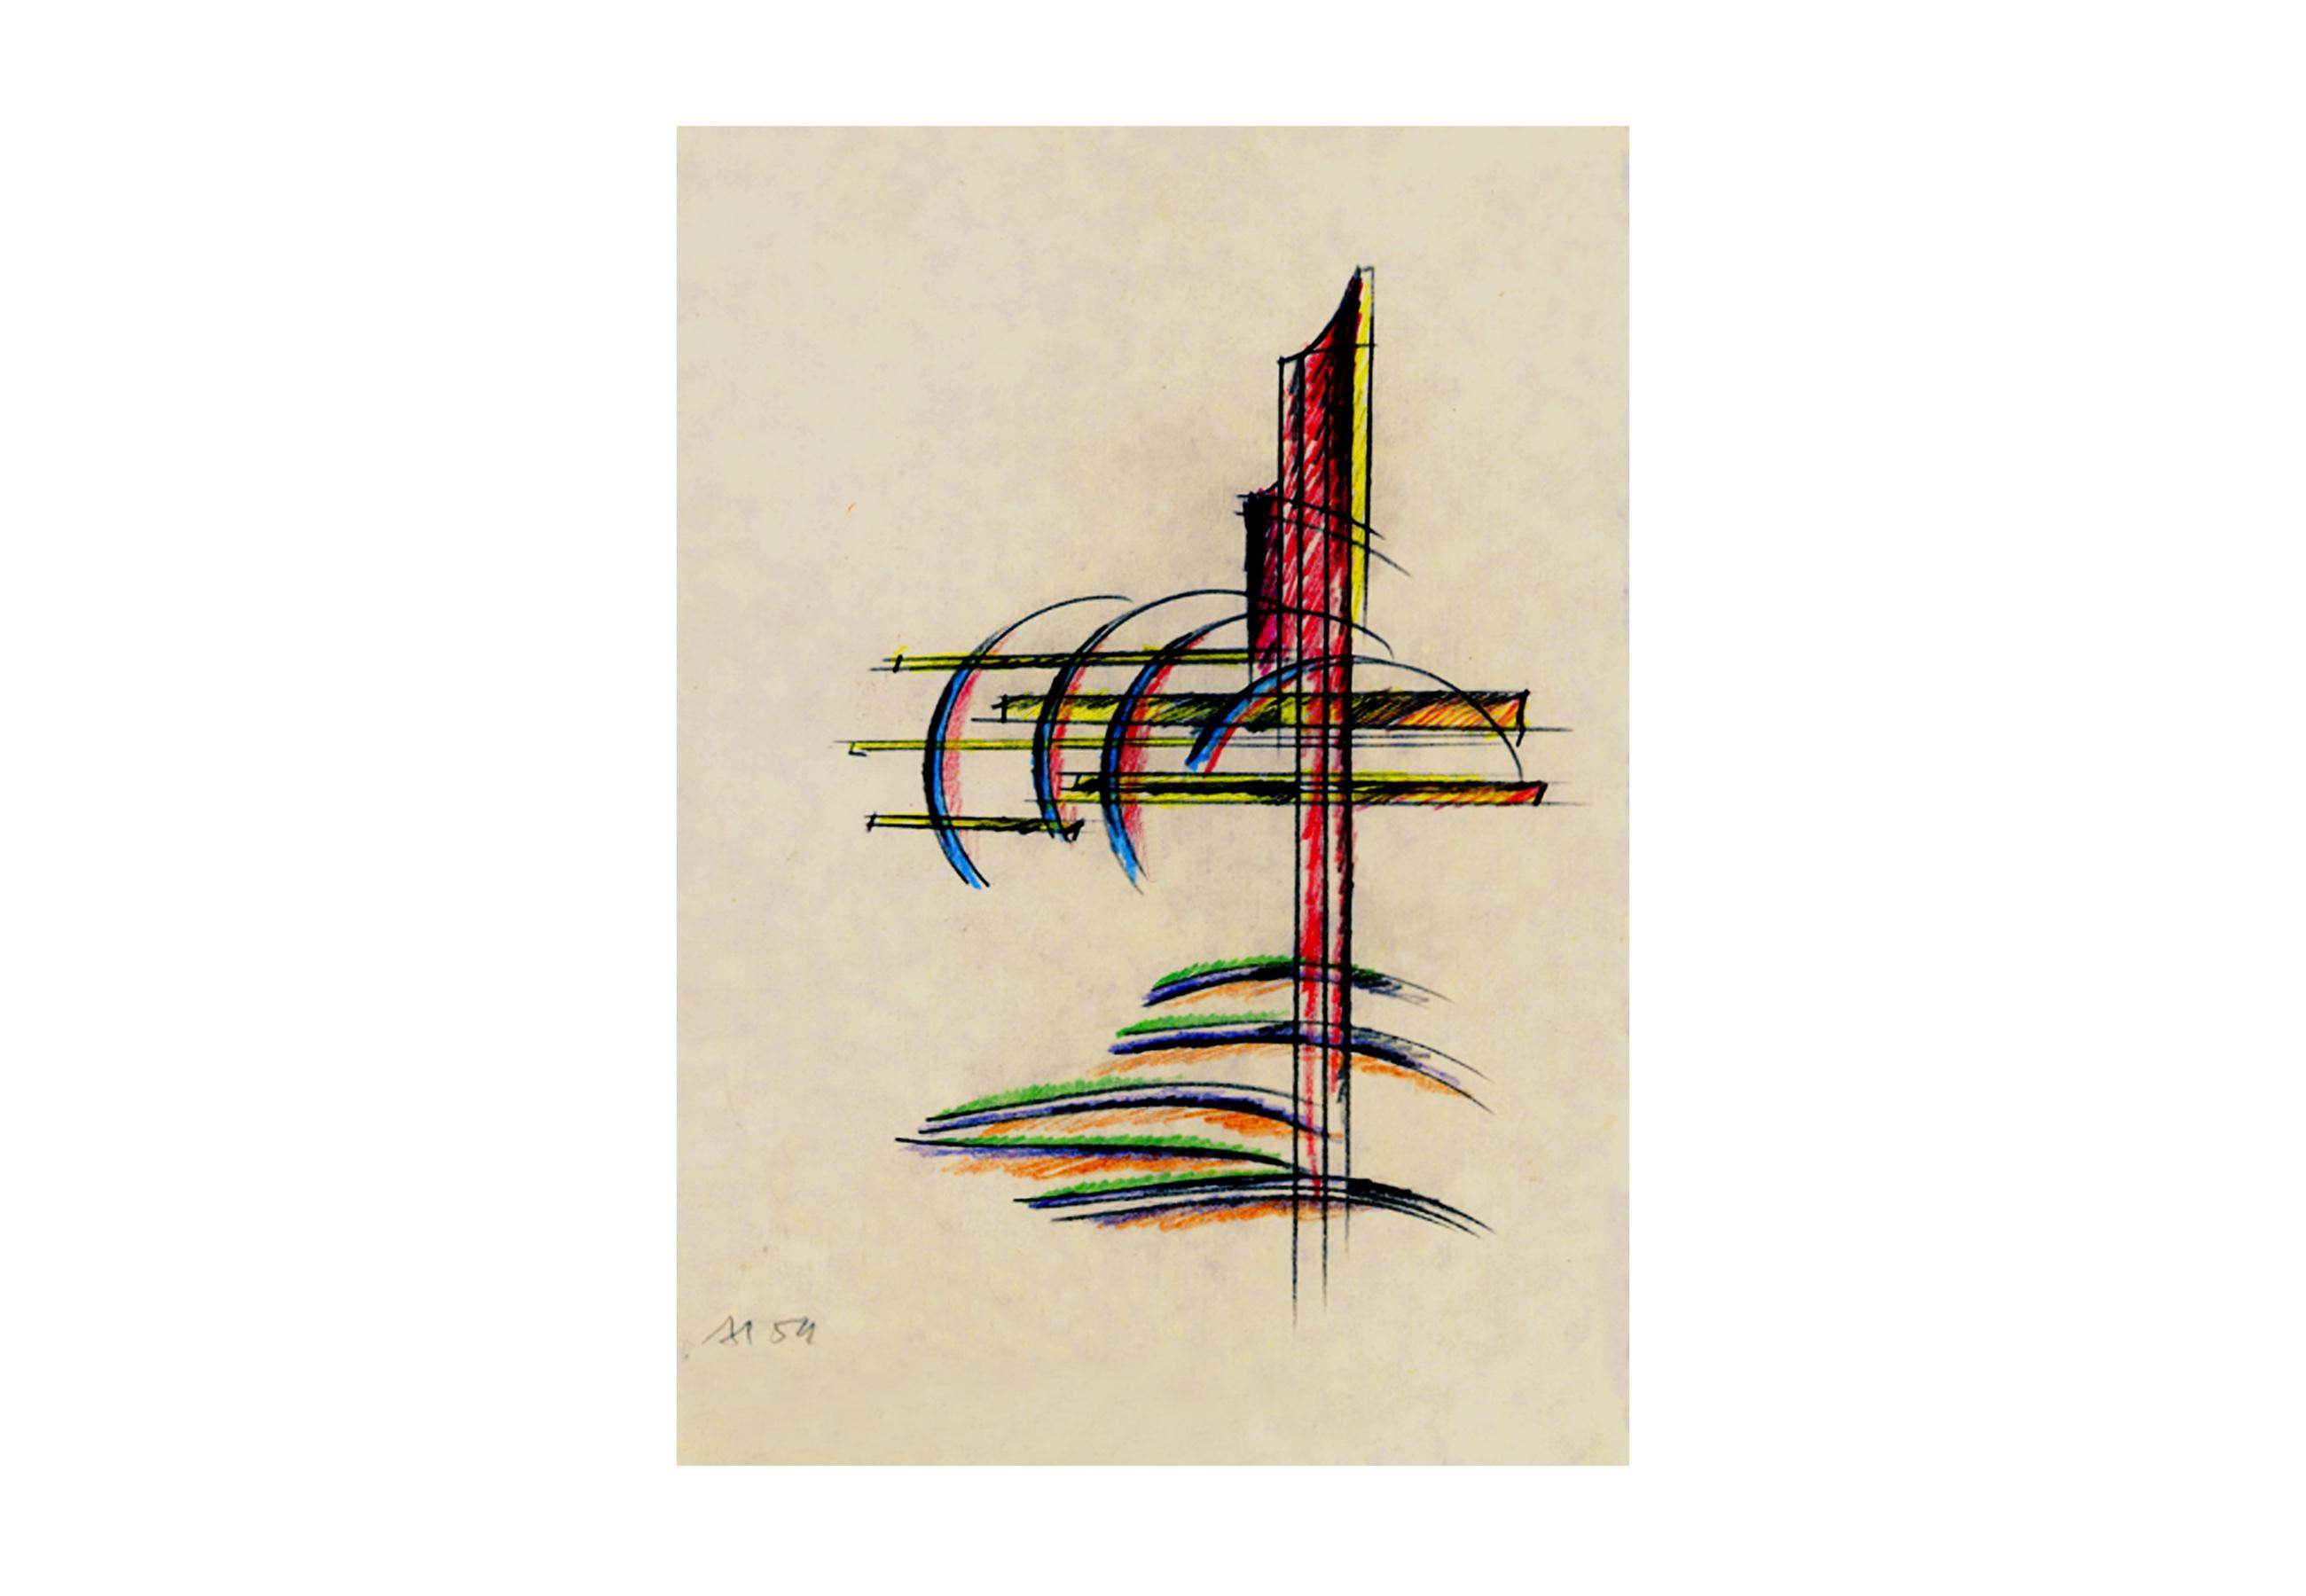 Lamm-Portfolio-1954-1955-13.jpg